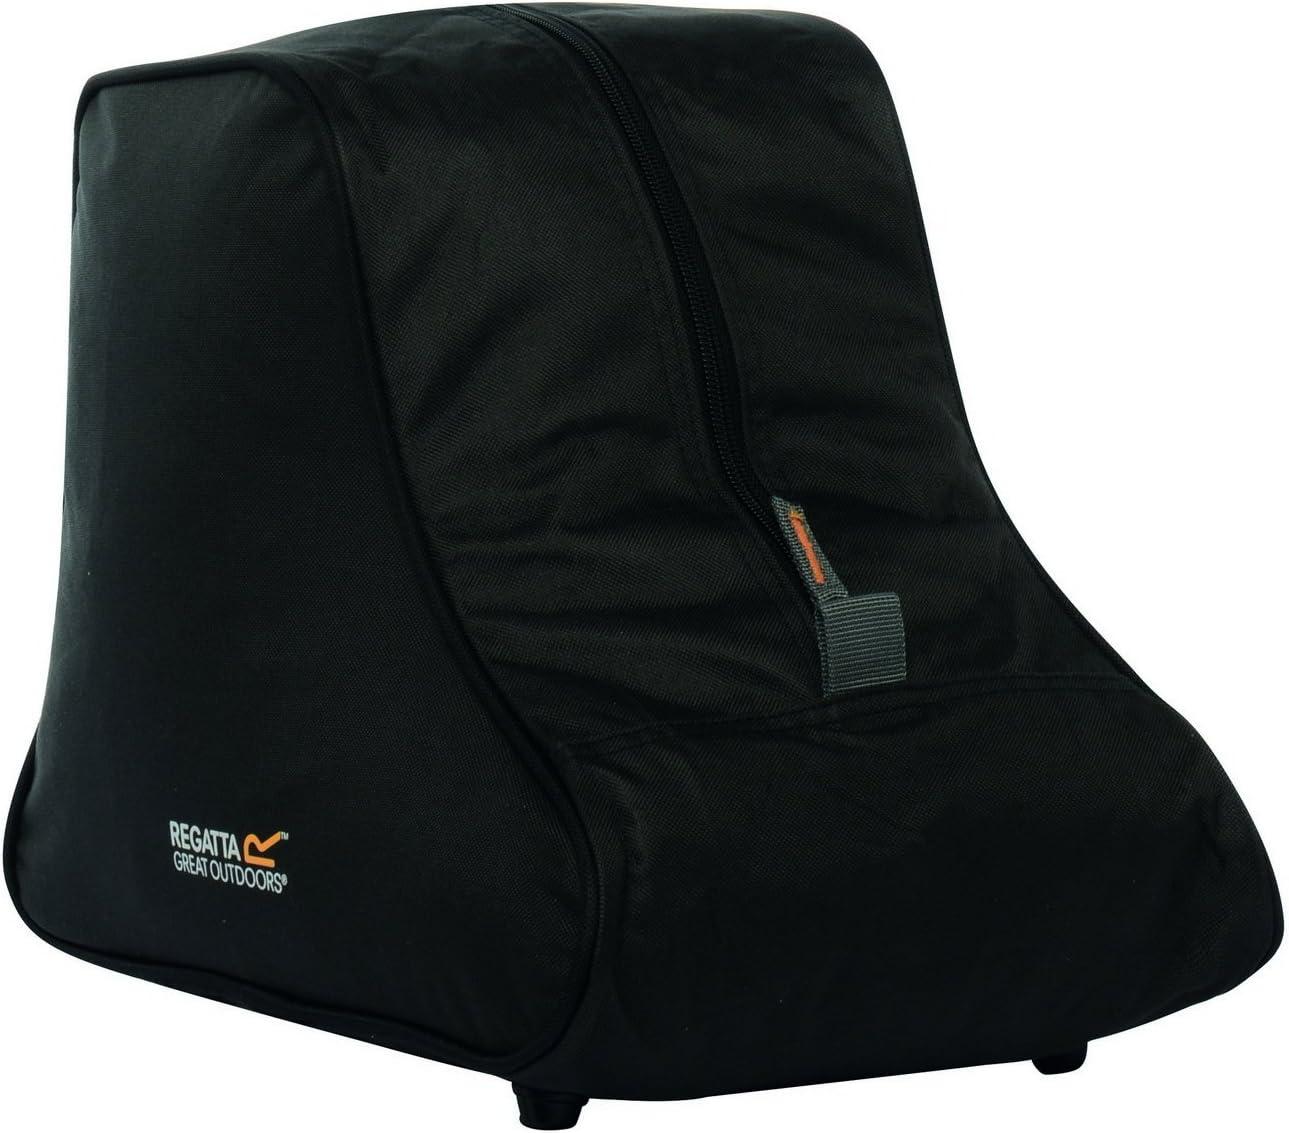 Regatta Boot Bag Rucksack Black